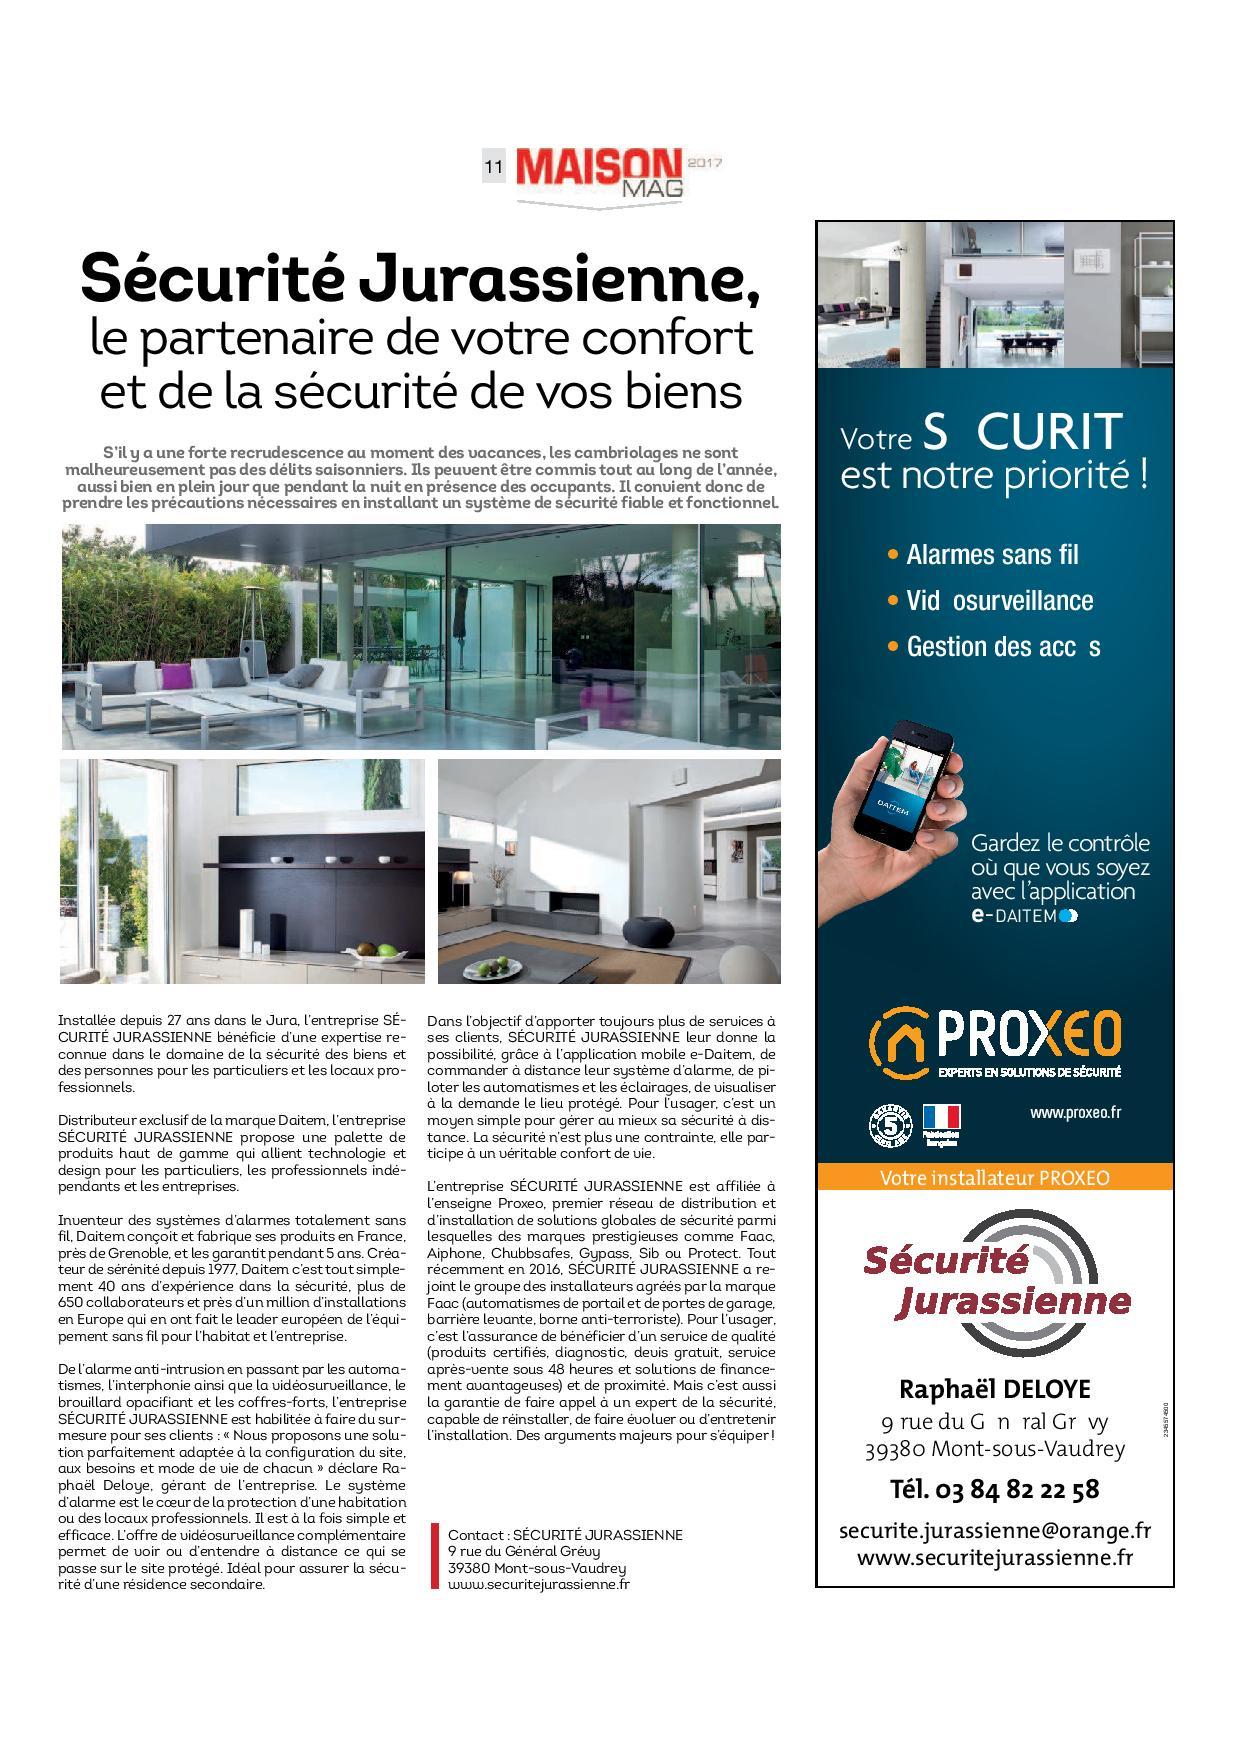 MaisonMagVDJ0317 sj 11-page-001